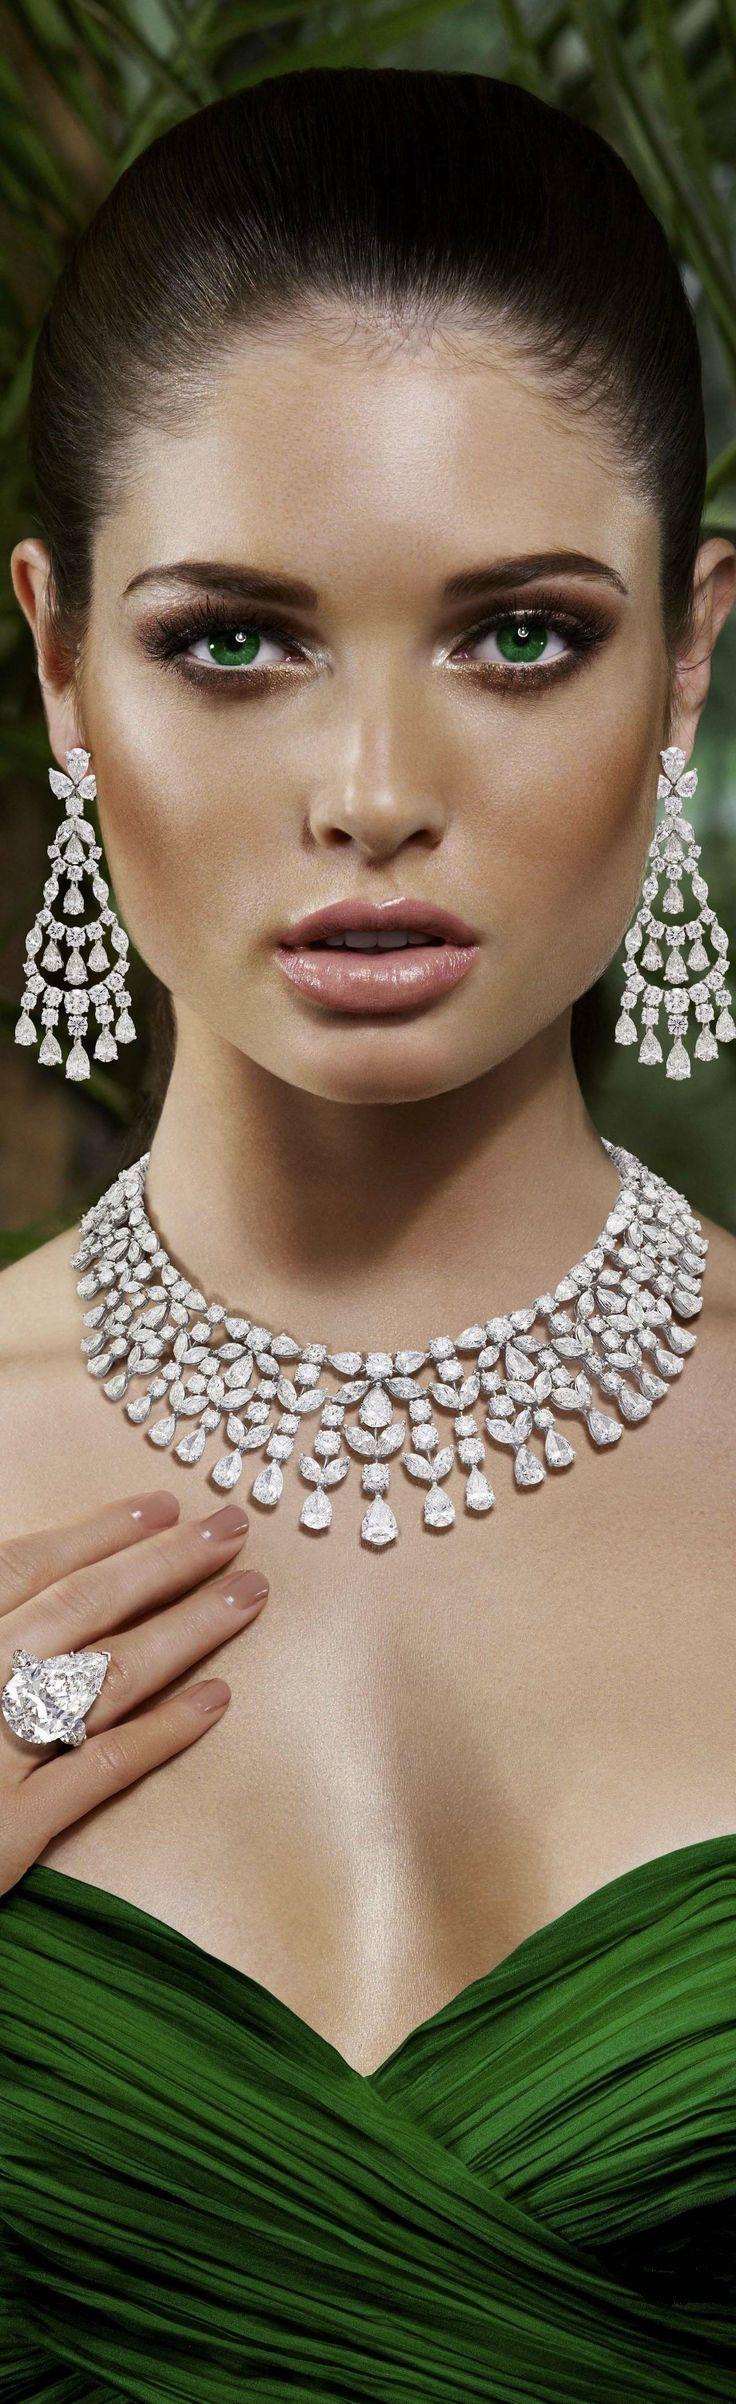 Jewelry ♔ML♔